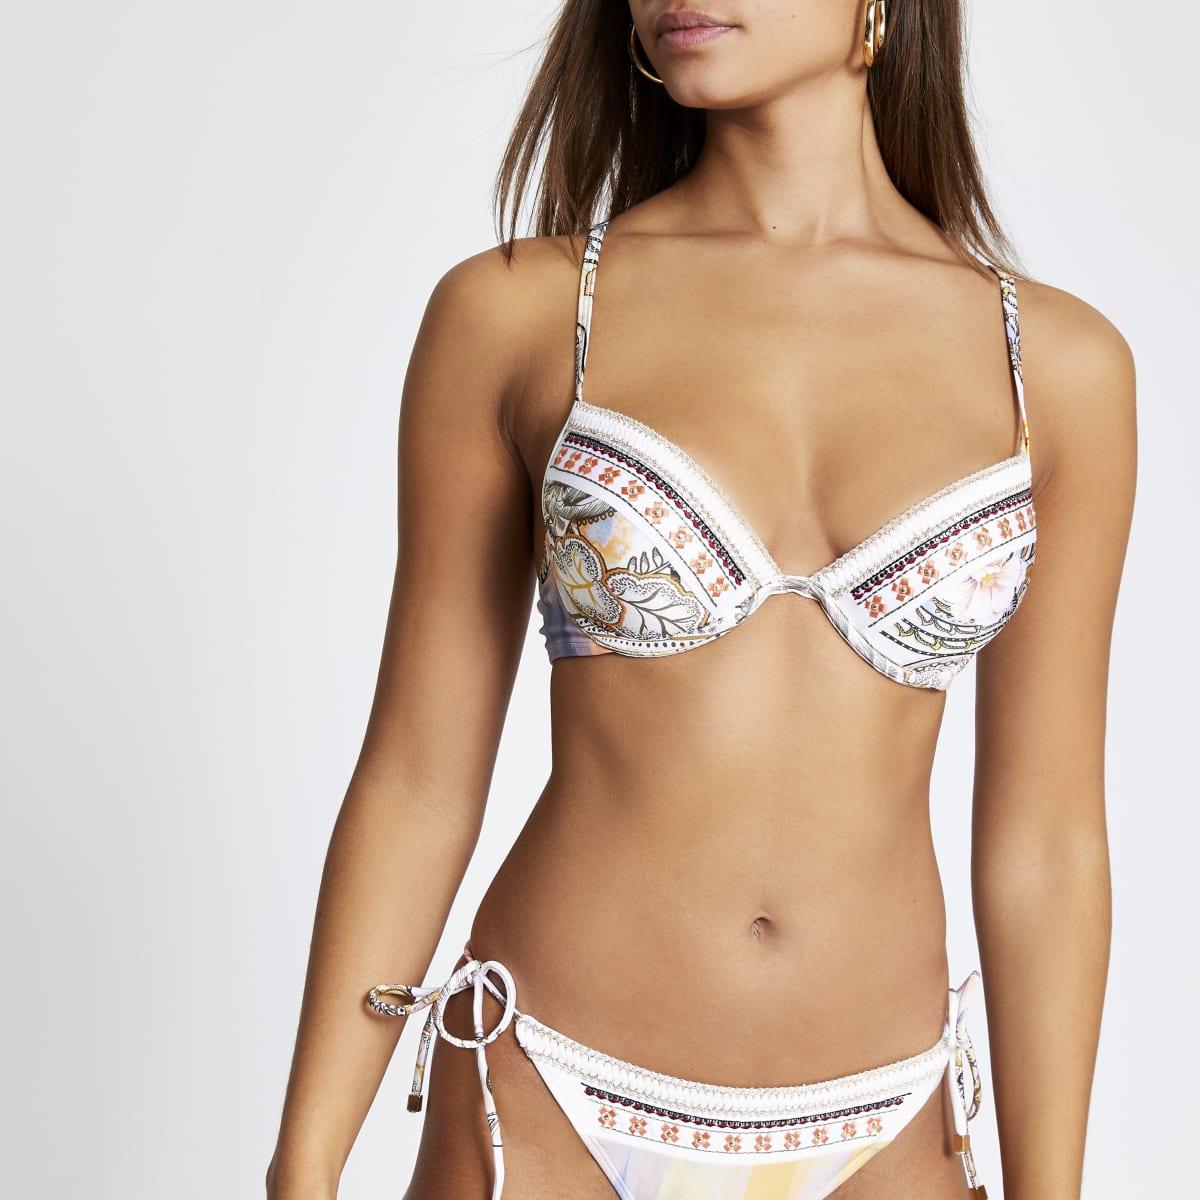 Cremefarbenes Bikinioberteil mit Paisley-Muster